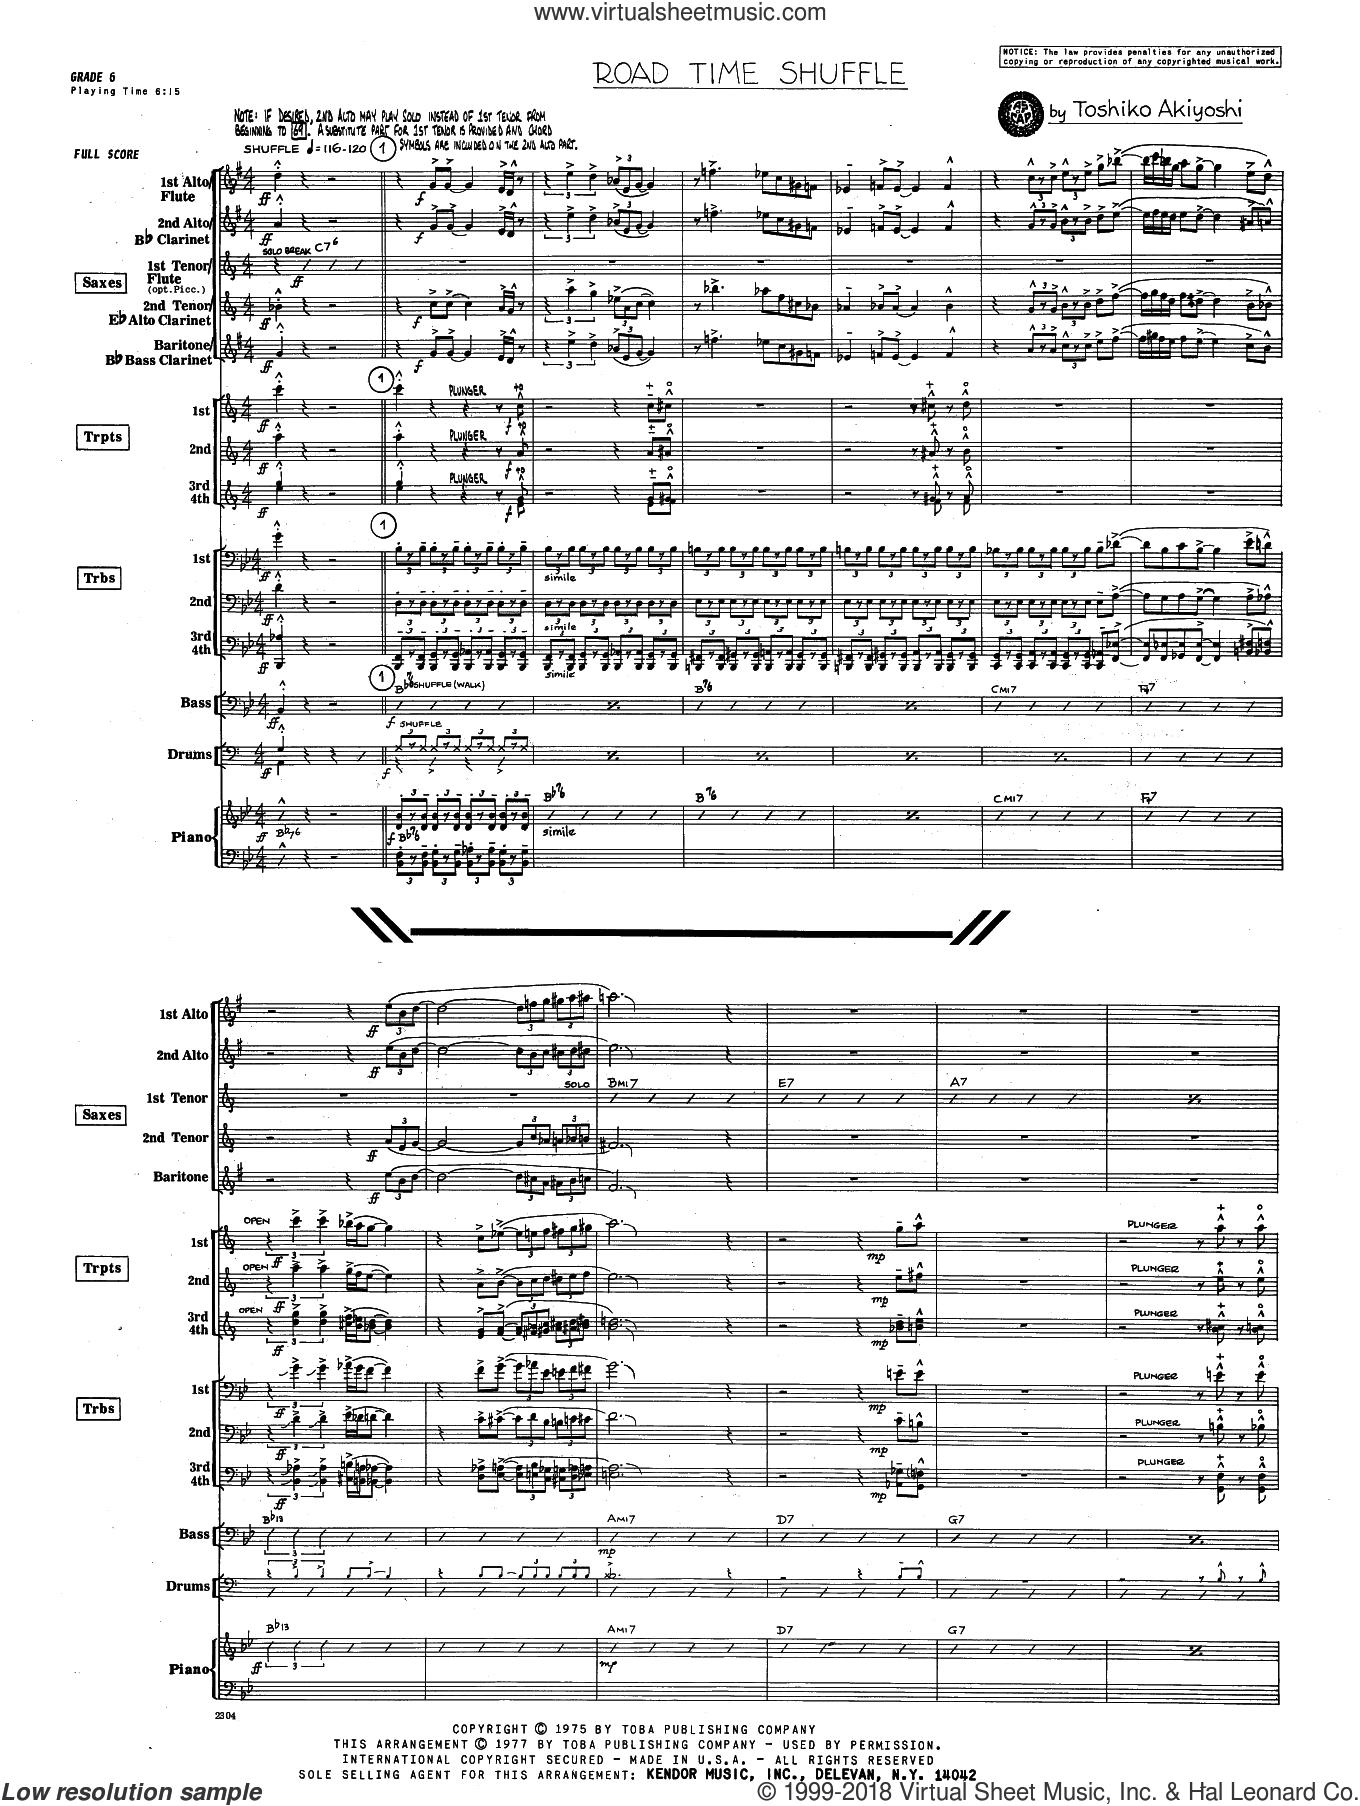 Road Time Shuffle (COMPLETE) sheet music for jazz band by Toshiko Akiyoshi, intermediate skill level